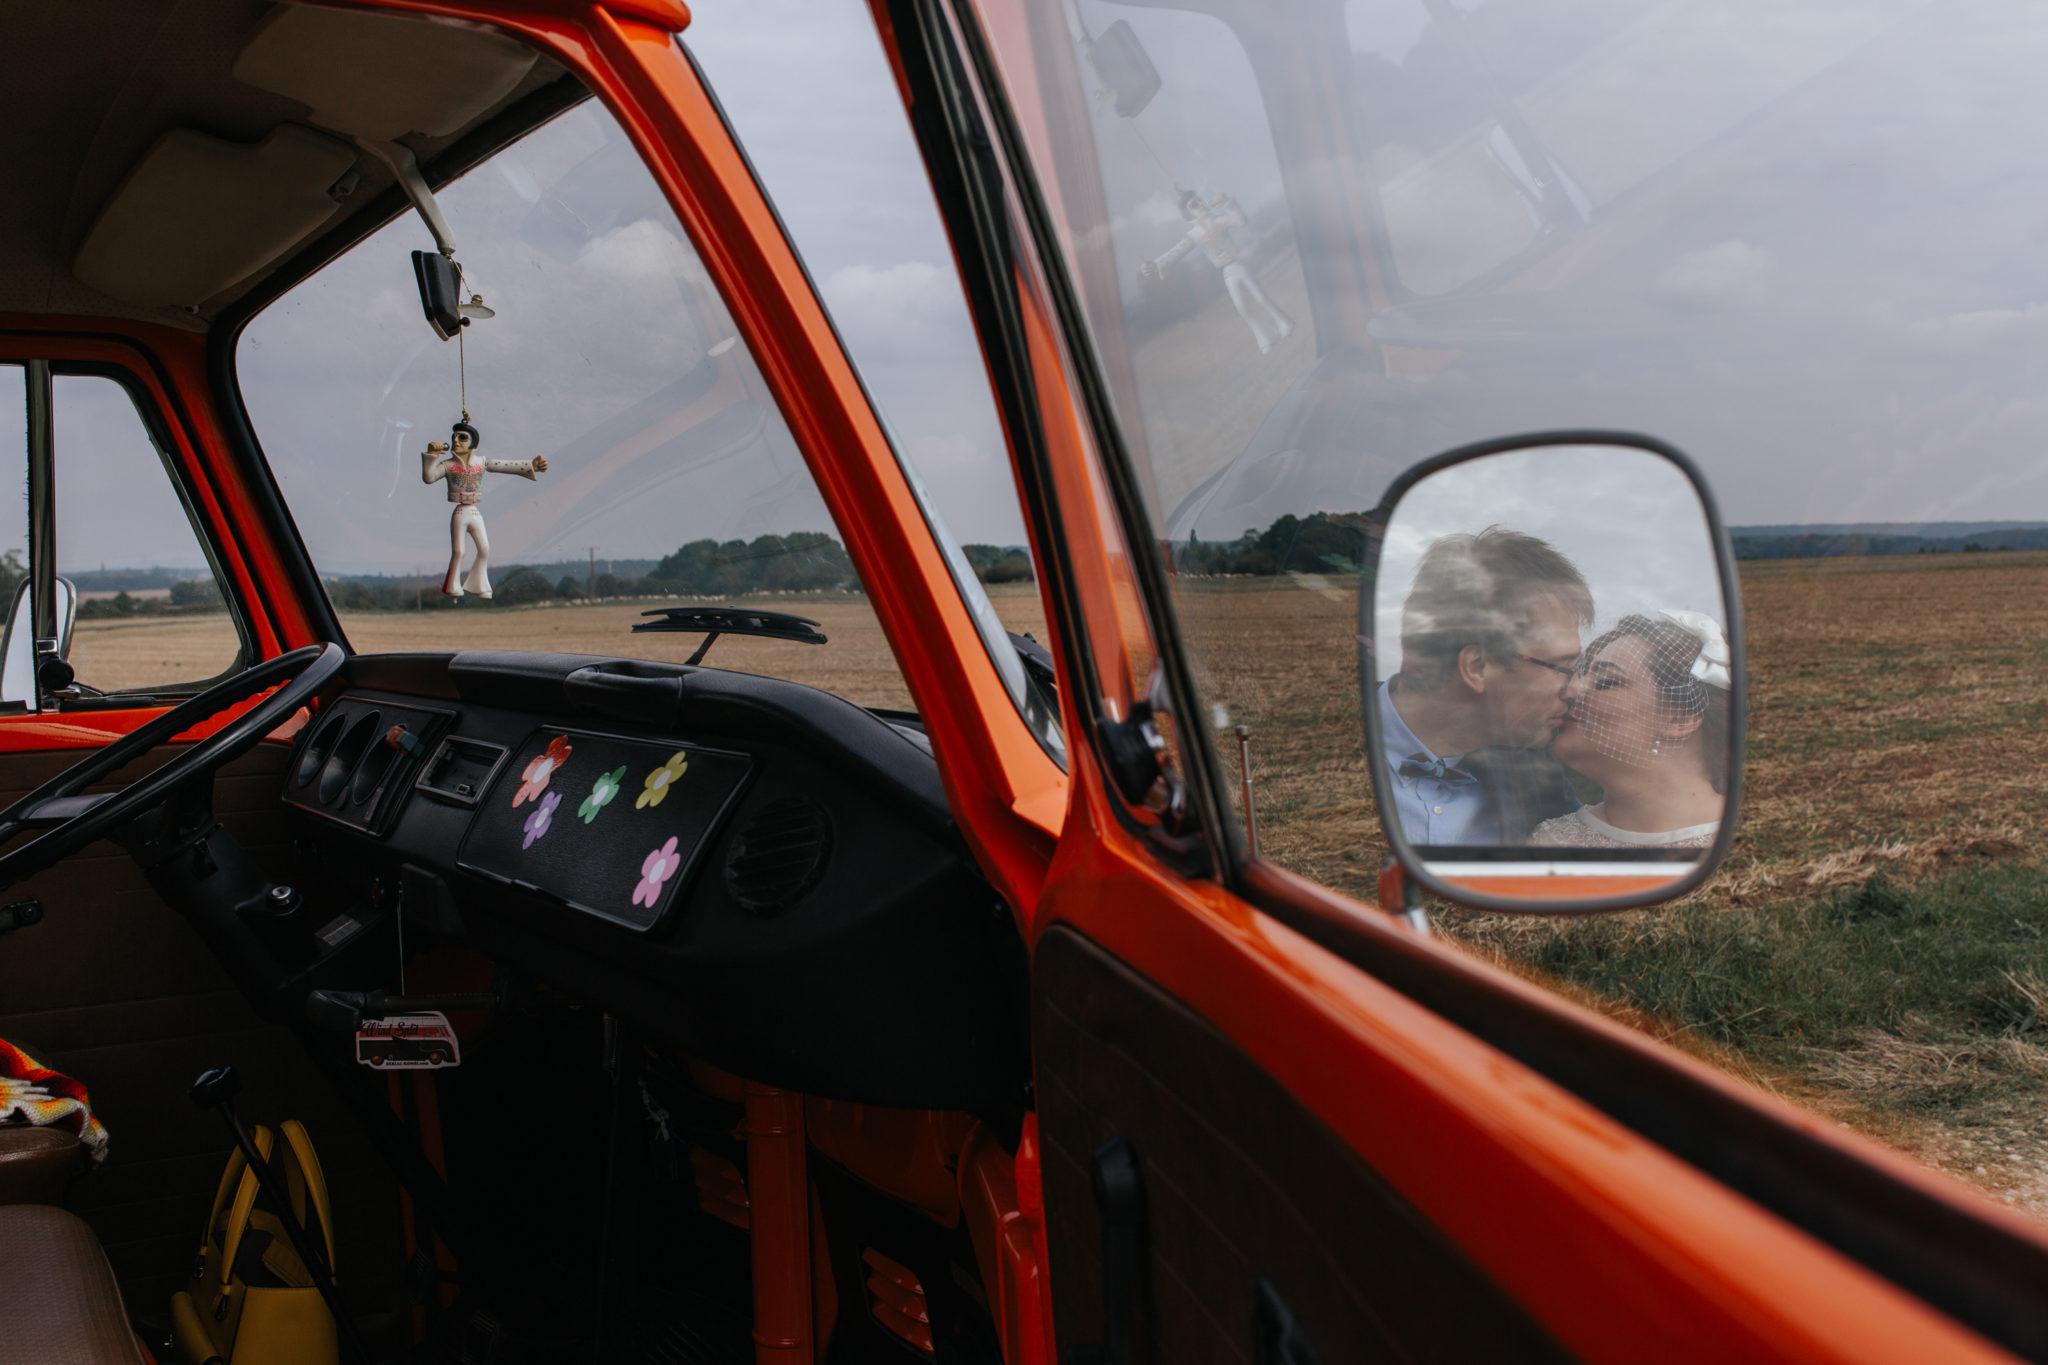 Baiser mariés champ combi vw volkswagen vintage orange Mariage 50s Domaine Mauvoisin Lommoye